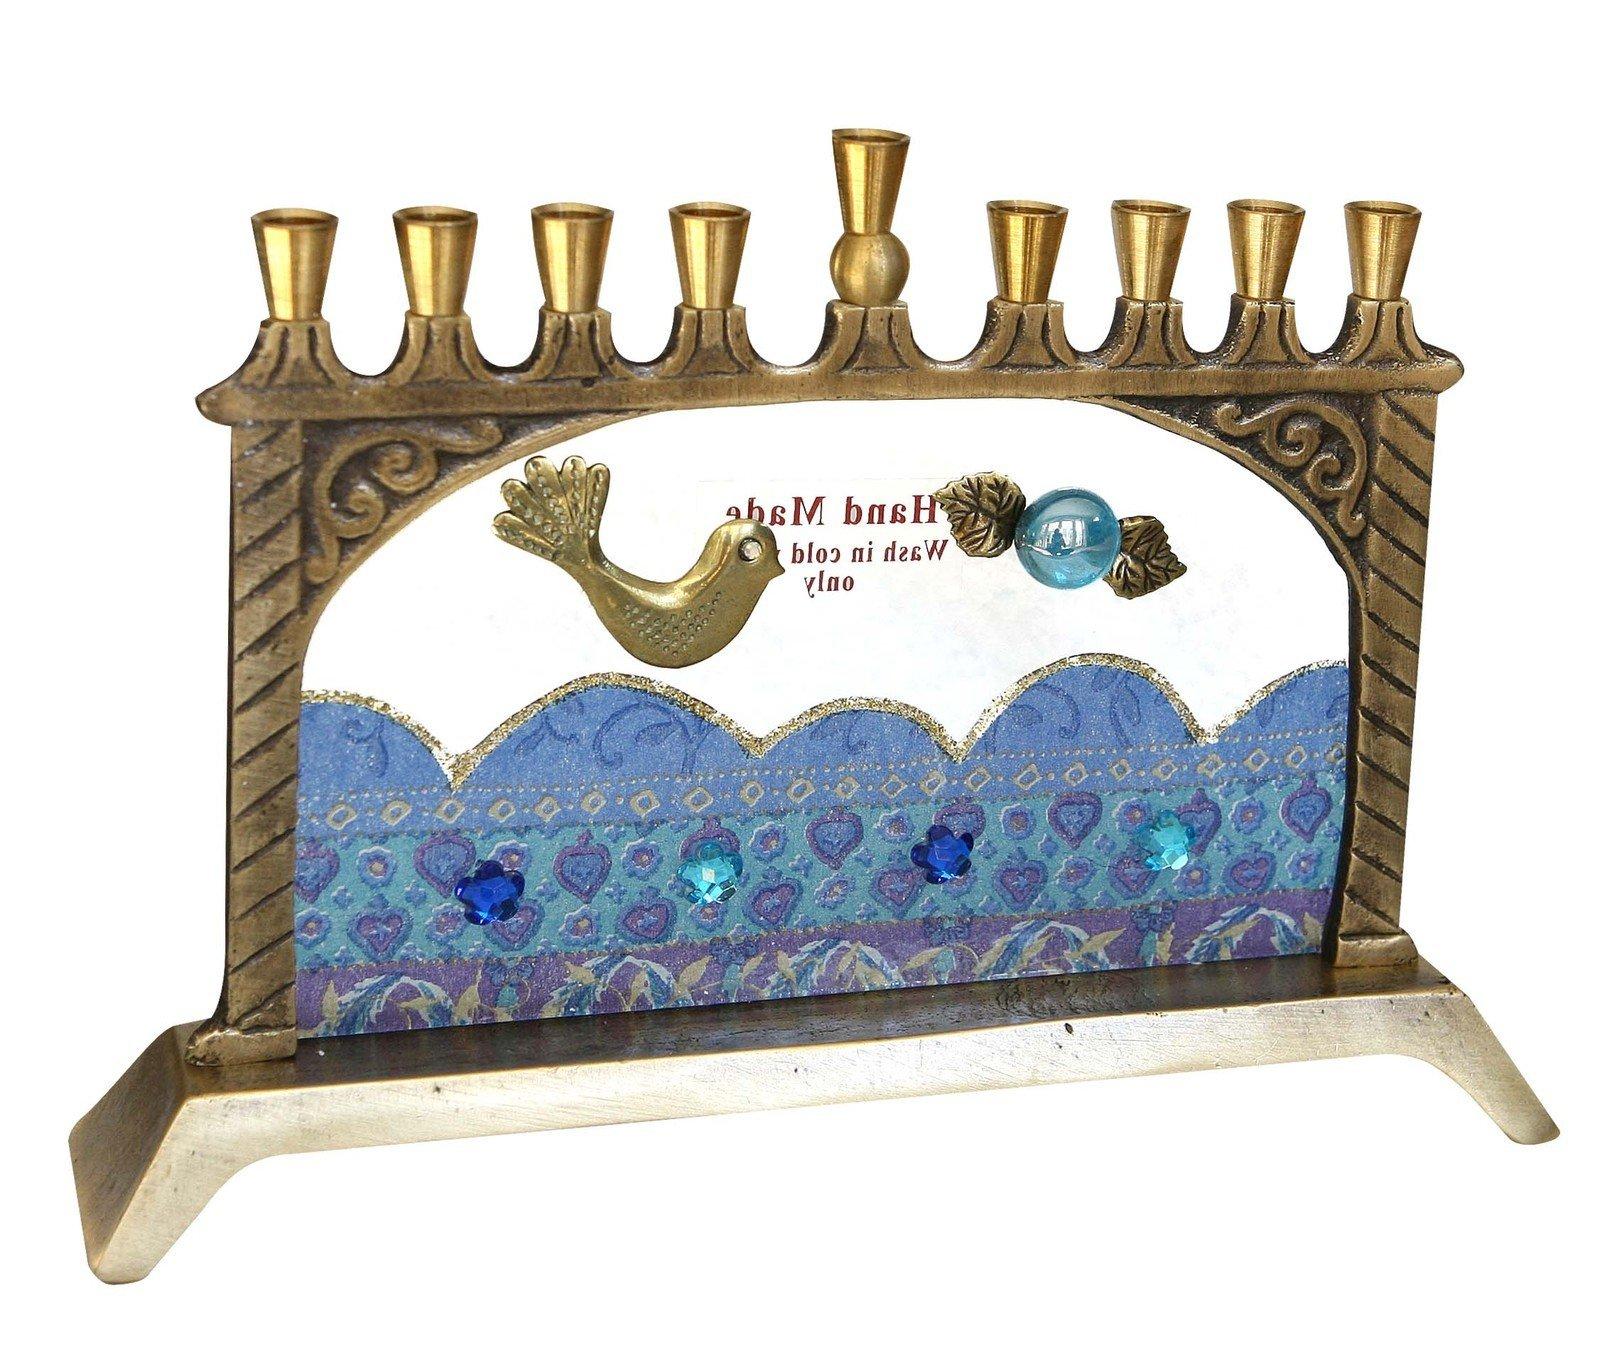 Hanukkah Menorah Hanukkia Unique Glass & Metal Collector's Decoupage Hand Made In Israel By The Artist Lili . Jewish Art. Great Gift For; Shabbat Chanoka Rabbi Temple Wedding Baby Naming Housewarming Bar Mitzvah Bat Mitzva and Jewish Homes.